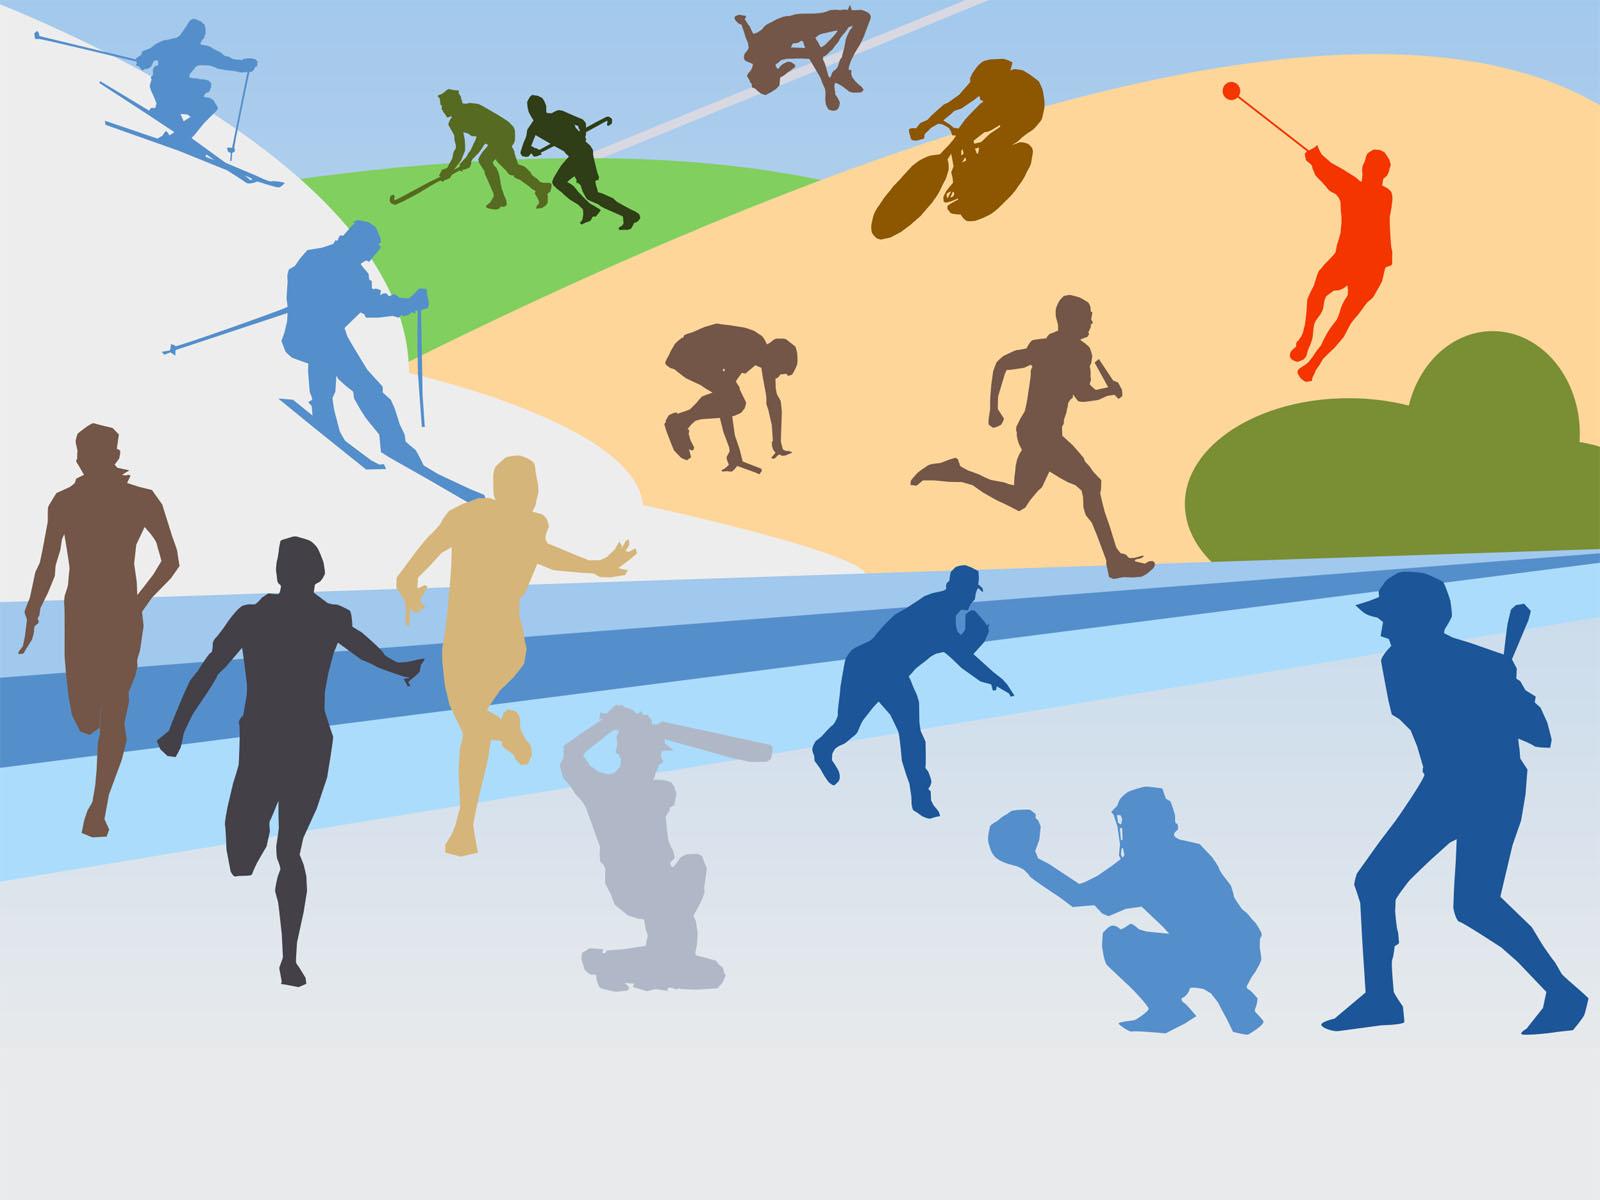 Sport Wallpaper All: All Sports Wallpaper